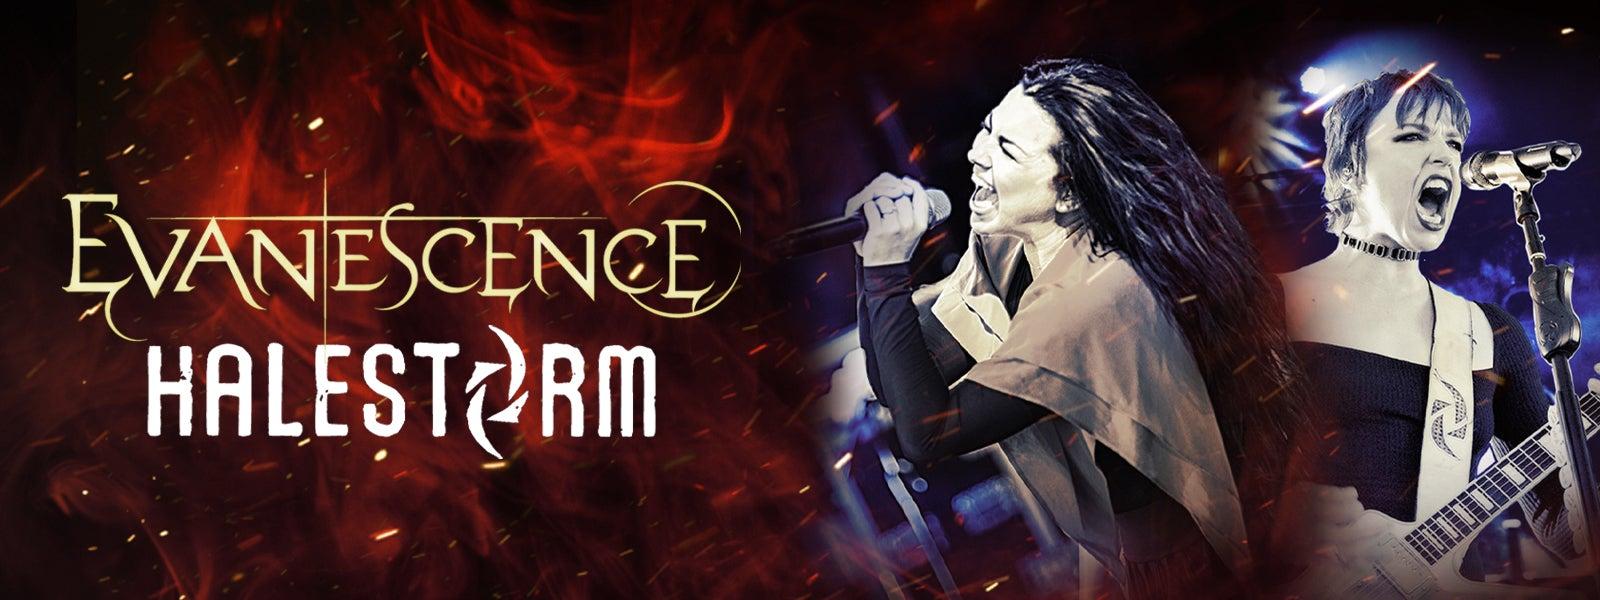 98ROCK's Not So Silent Night: Evanescence + Halestorm